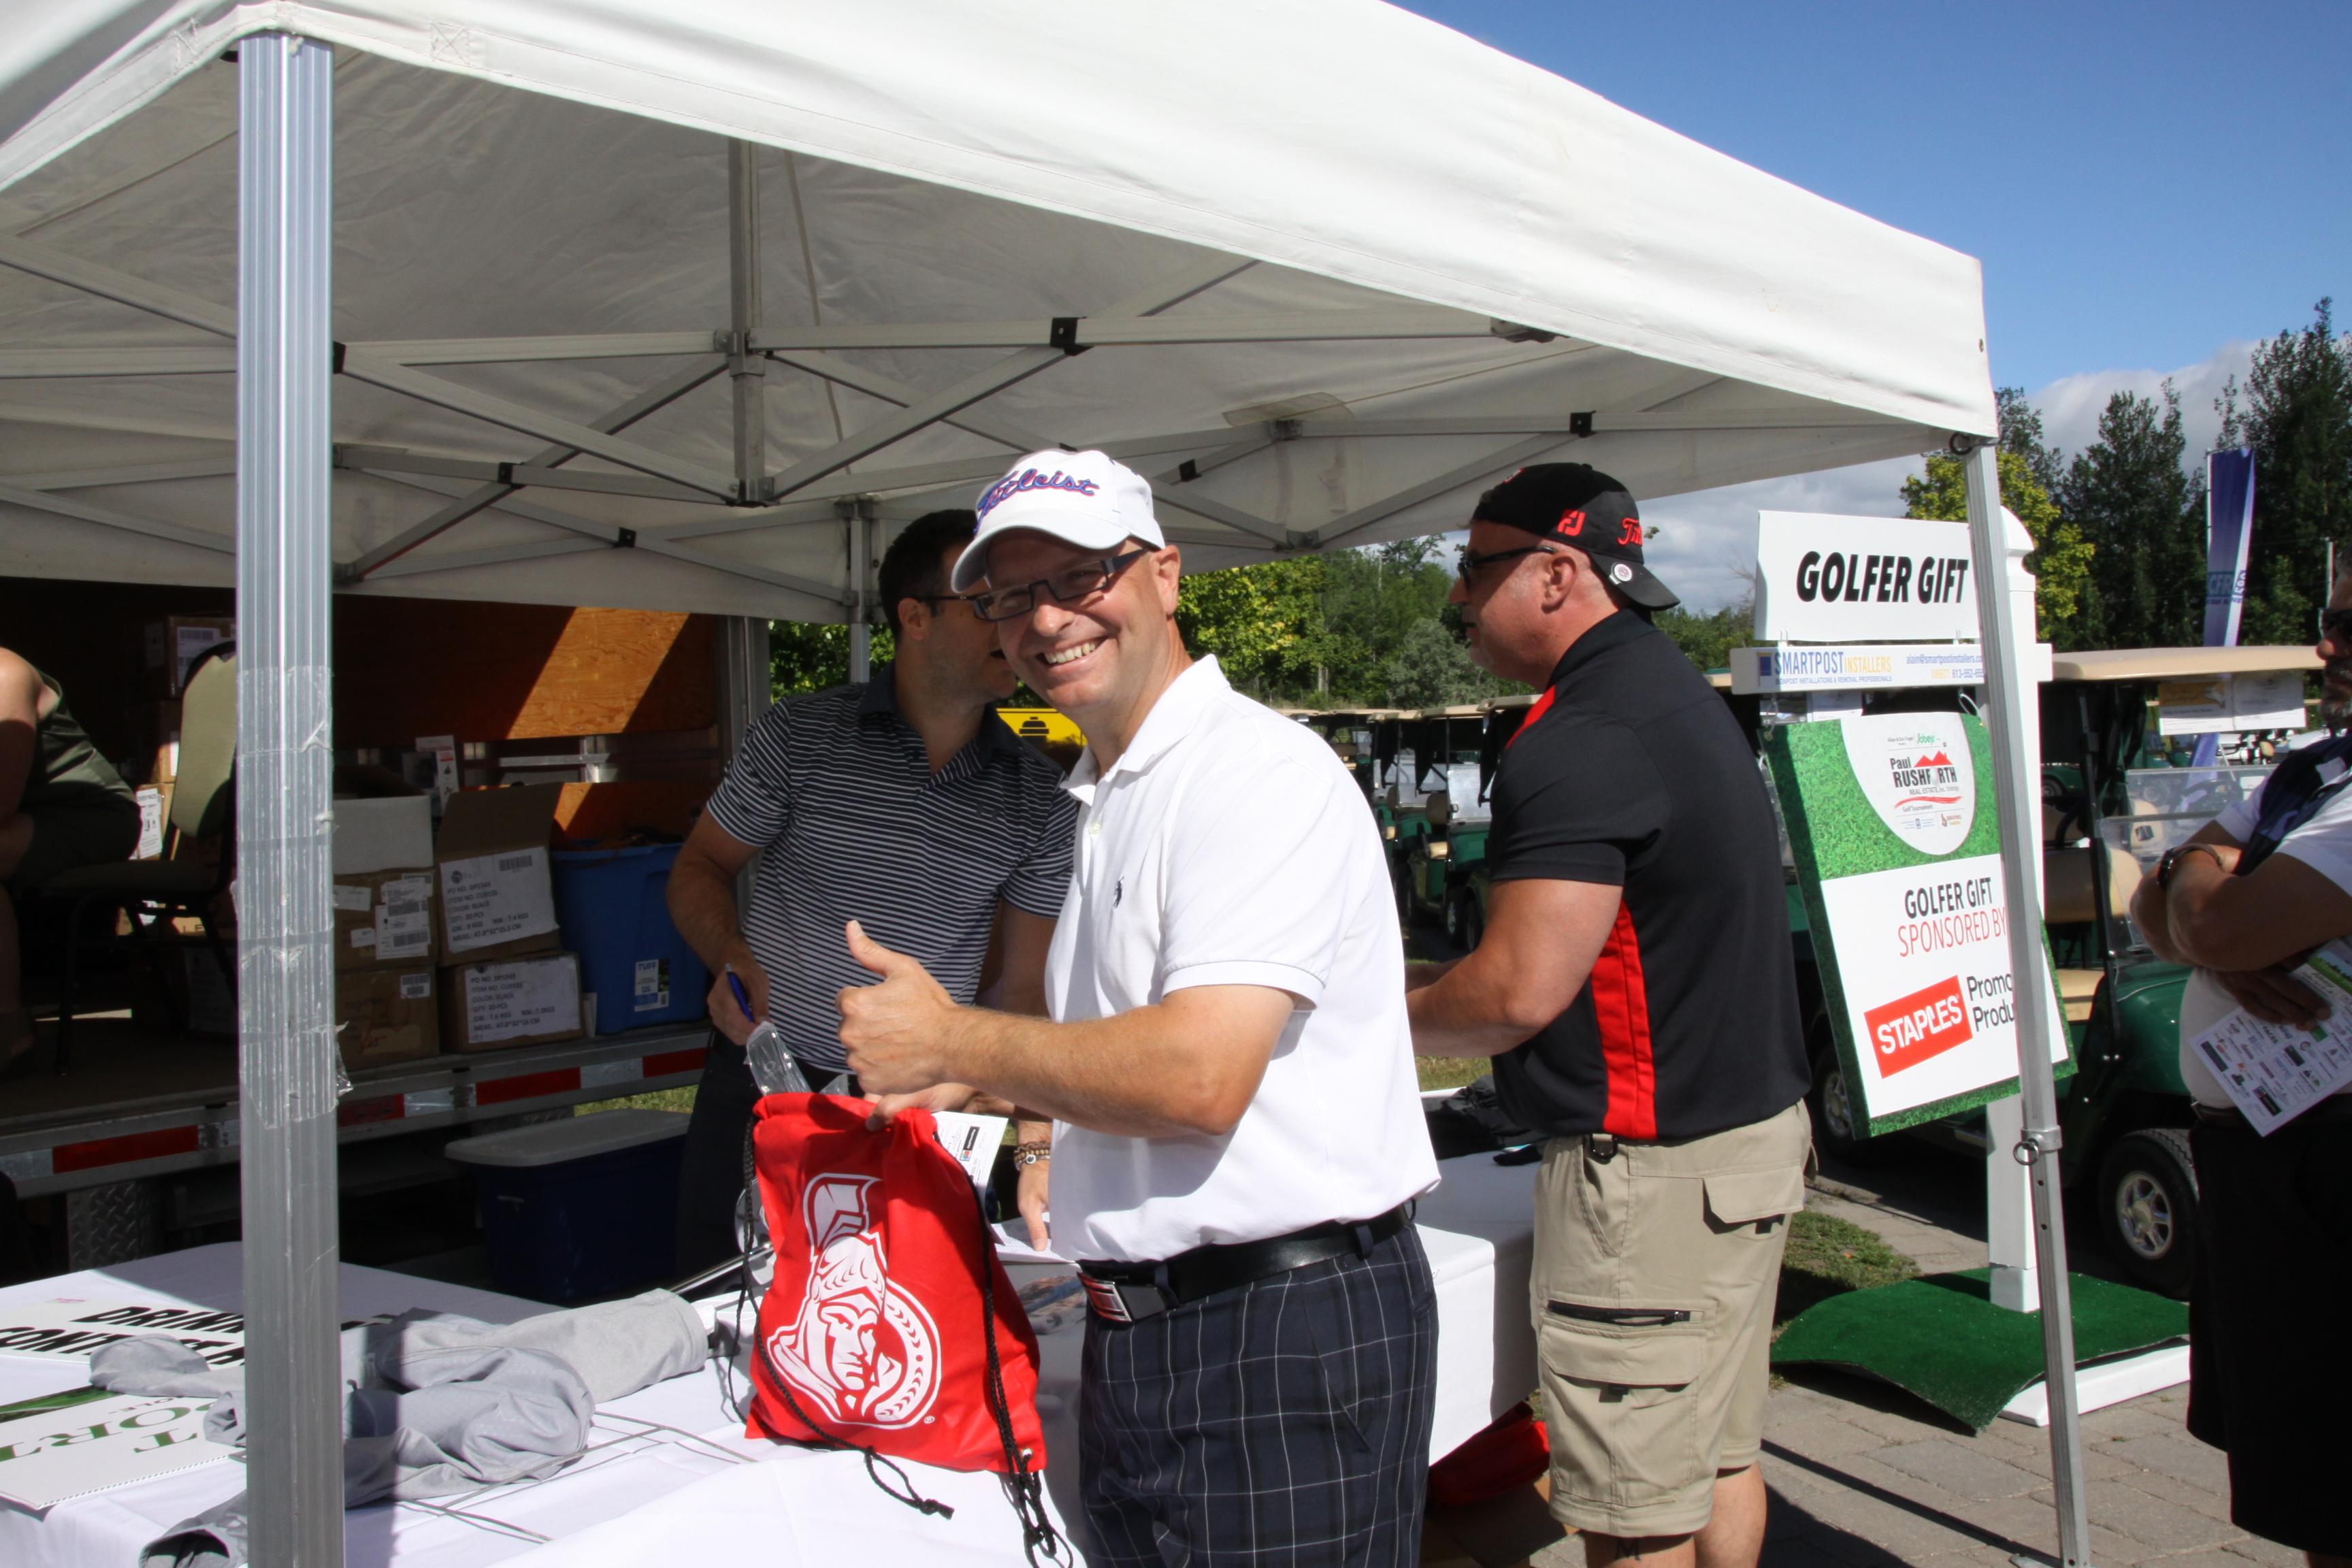 PRgolf2018 (12) Golfer gift